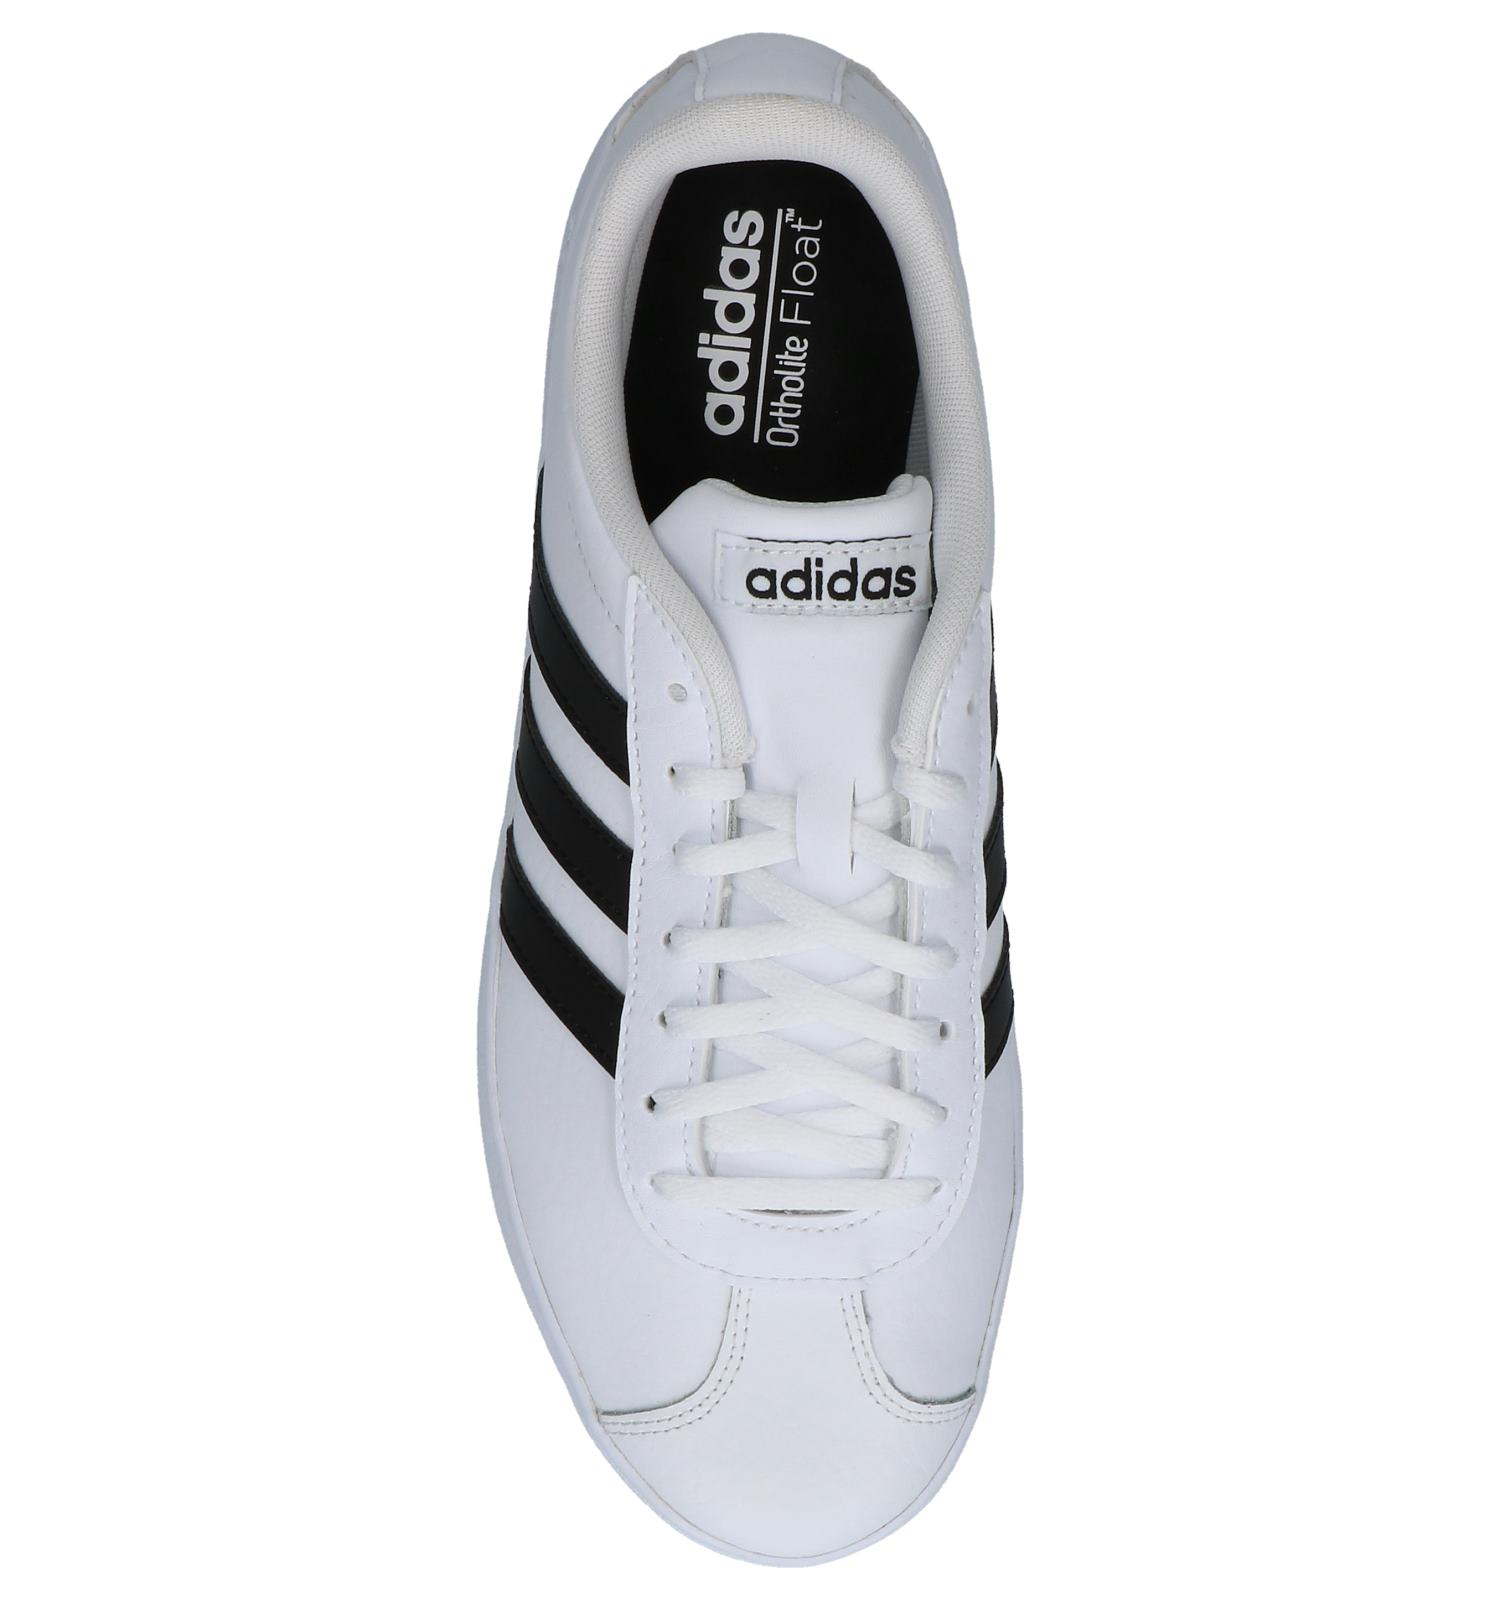 9509abadef3 Witte Lage Sportieve Sneakers adidas VL Court 2.0 | TORFS.BE | Gratis  verzend en retour